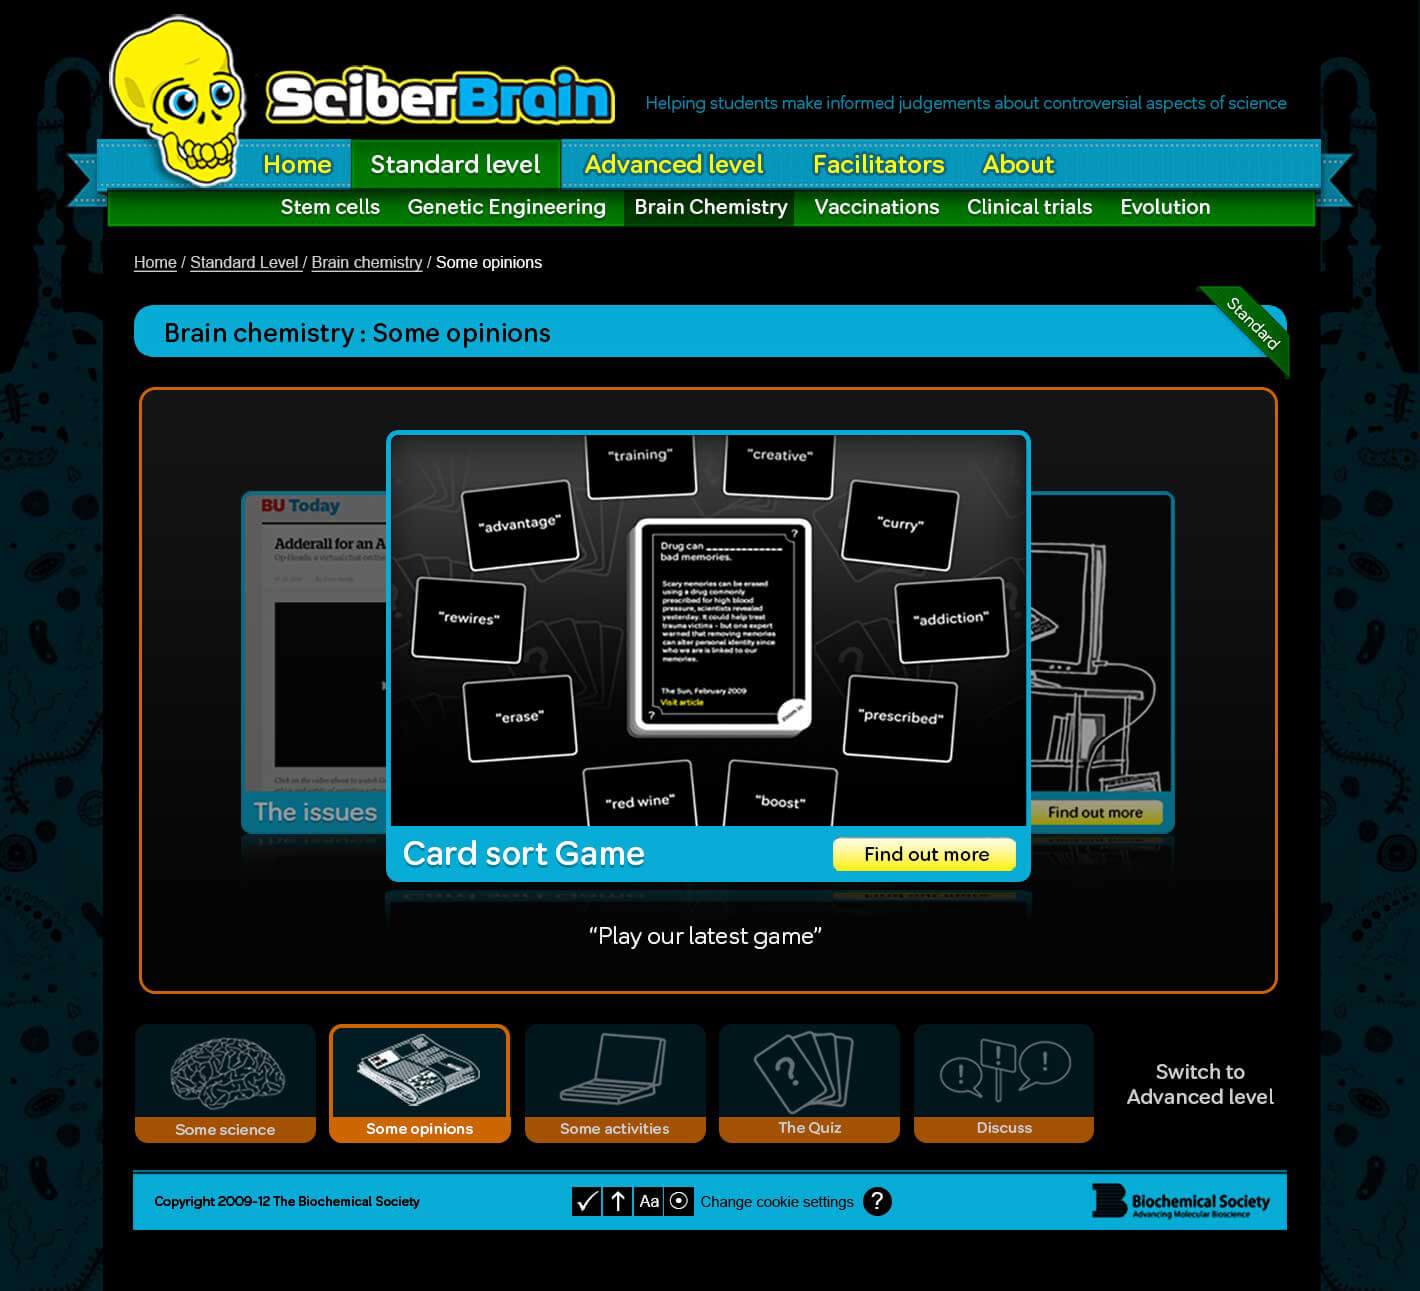 sciber6